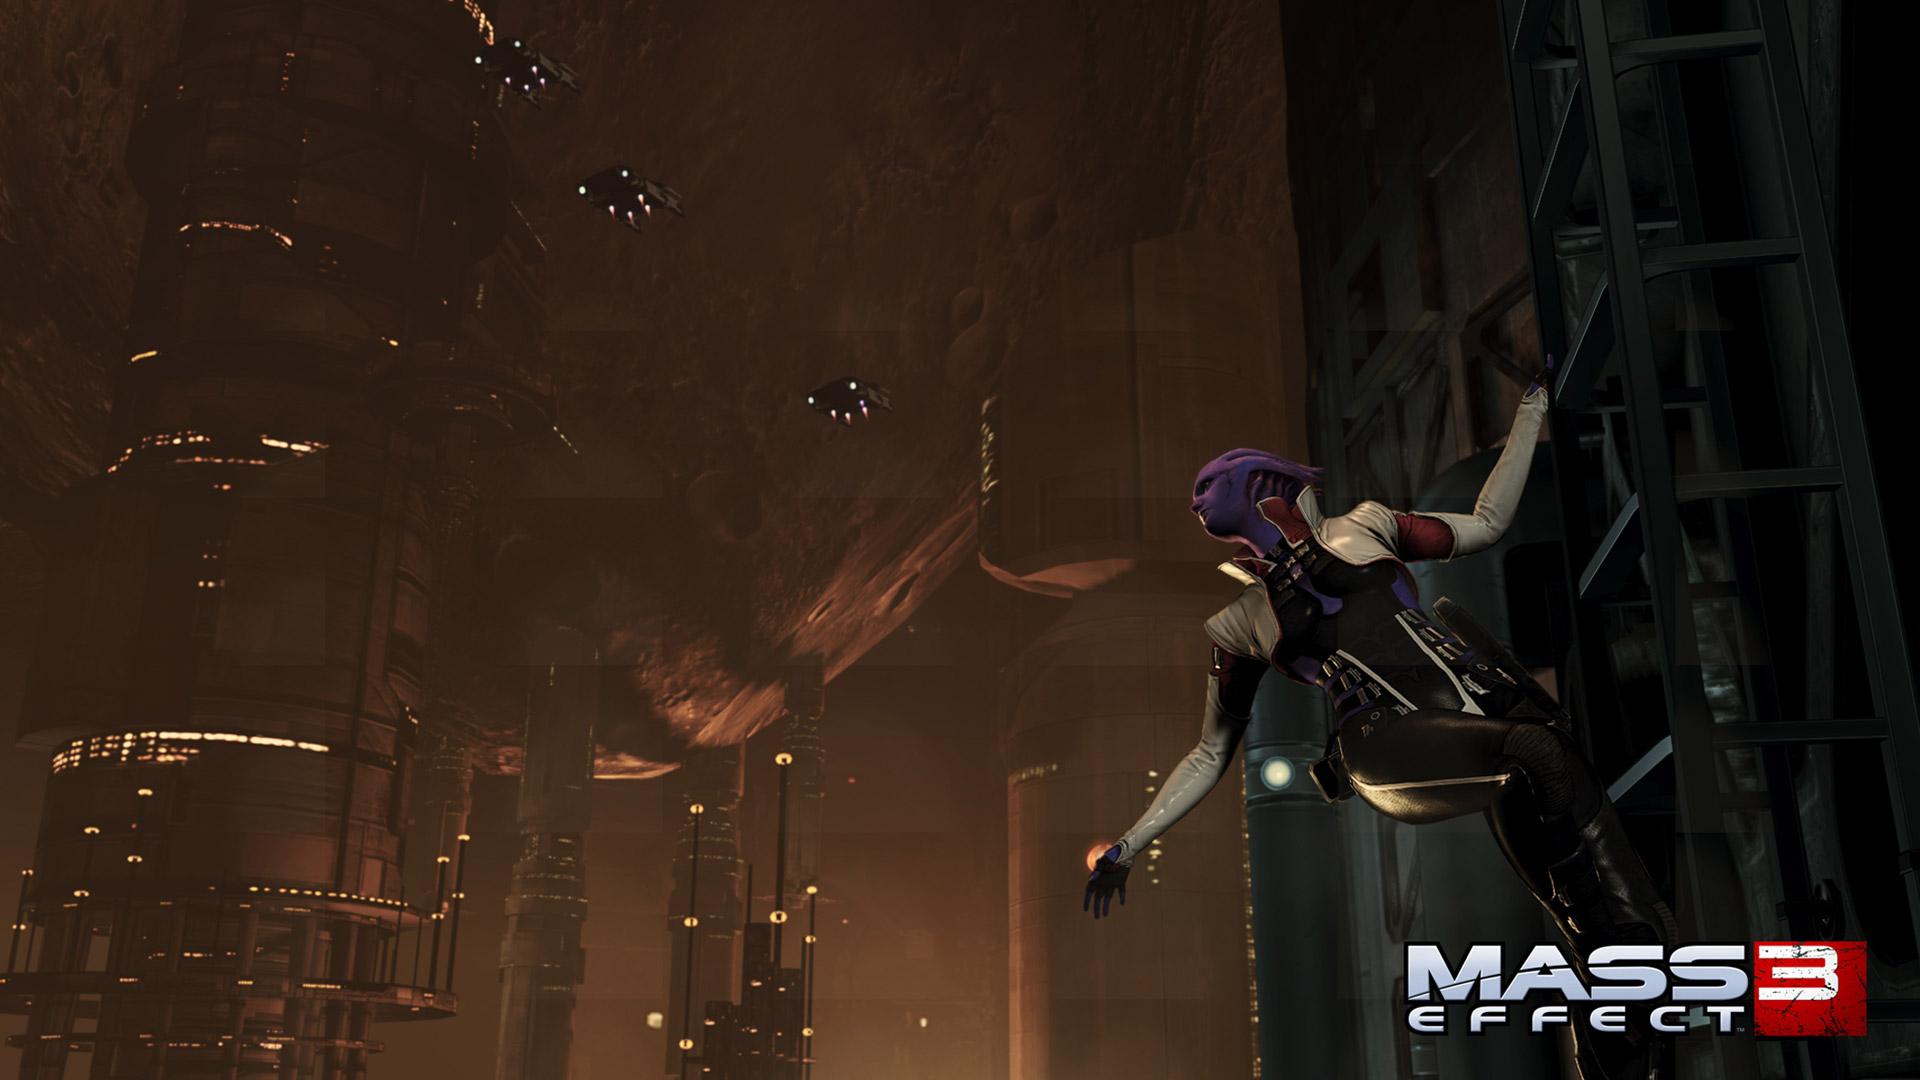 Free Mass Effect 3 Wallpaper in 1920x1080